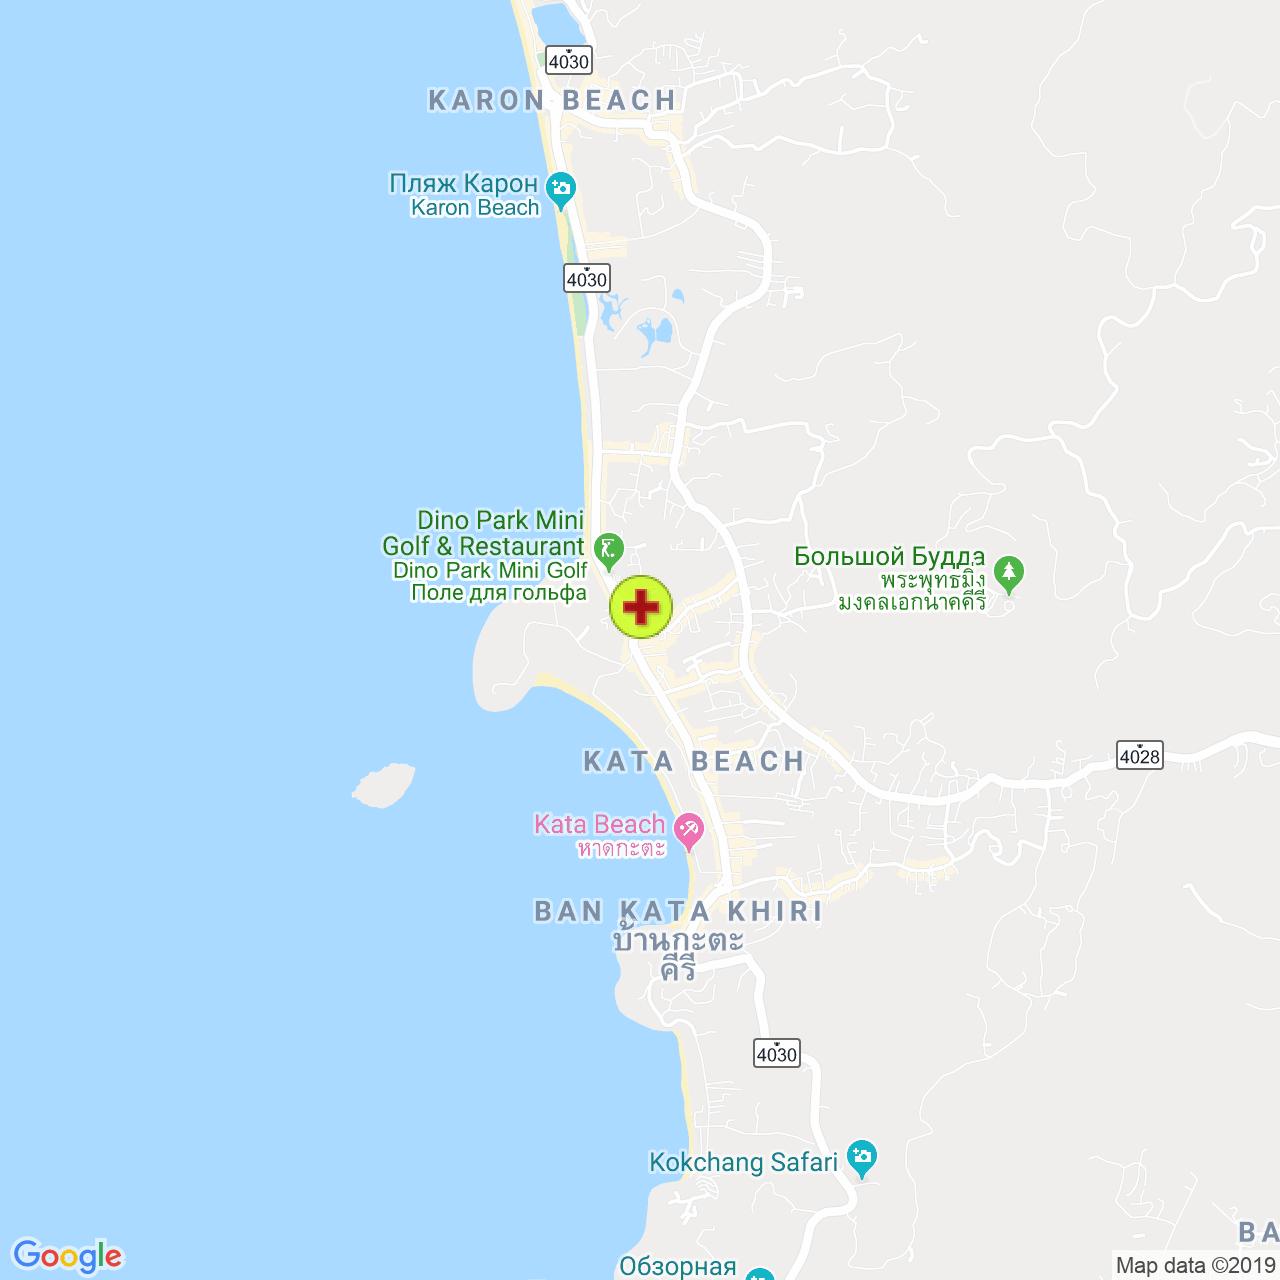 Sai nam yen international clinic @ Kata на карте Пхукета